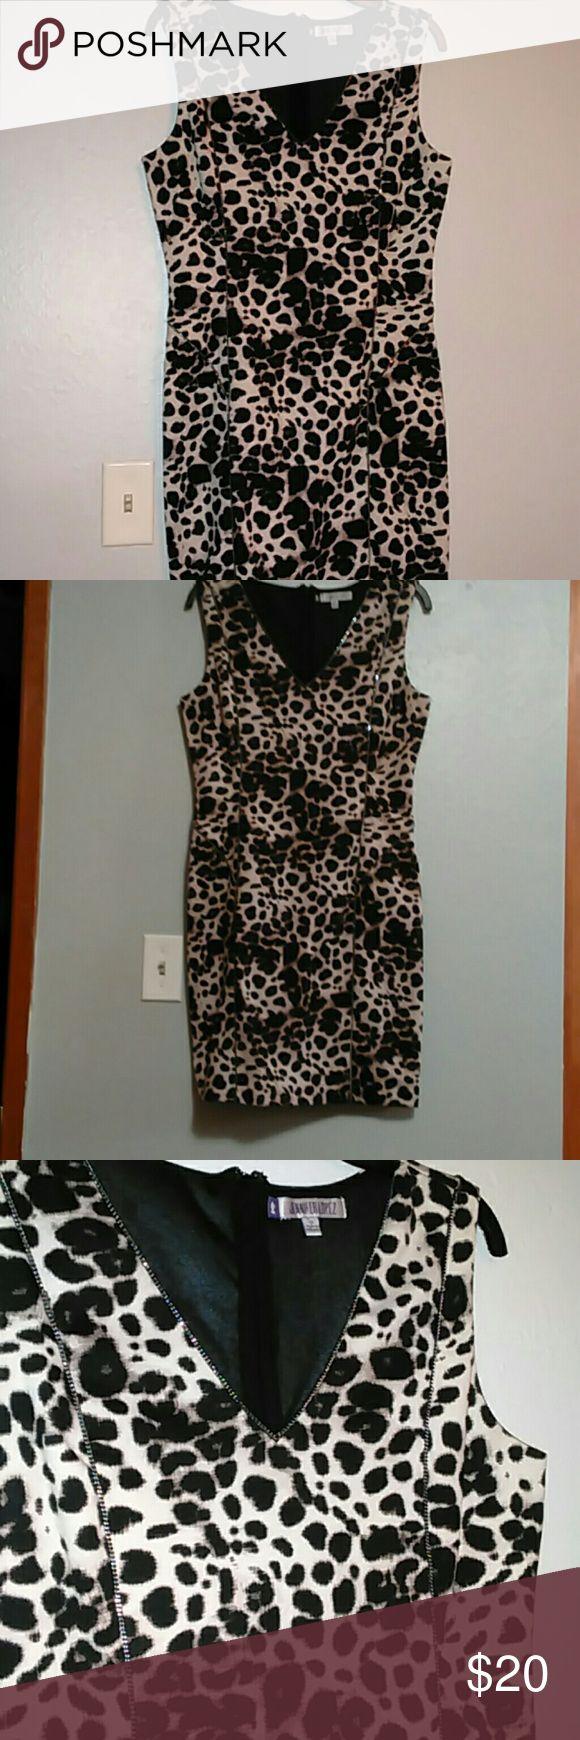 Jlo cheetah dress Worn twice, in new condition:) Jennifer Lopez Dresses Midi